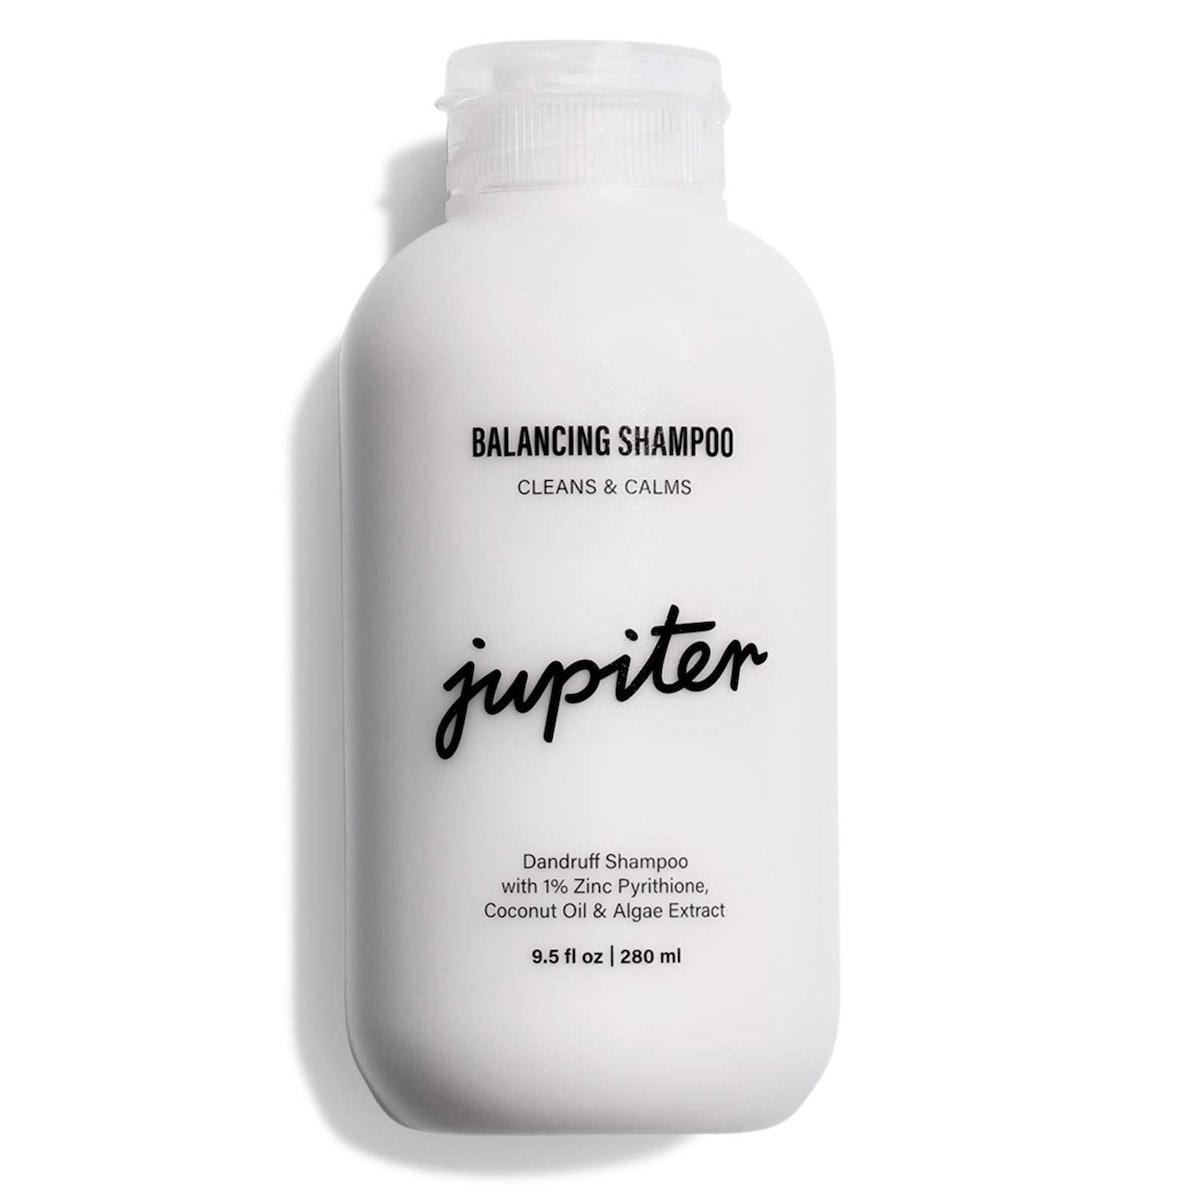 Jupiter Premium Medicated Dandruff Balancing Shampoo